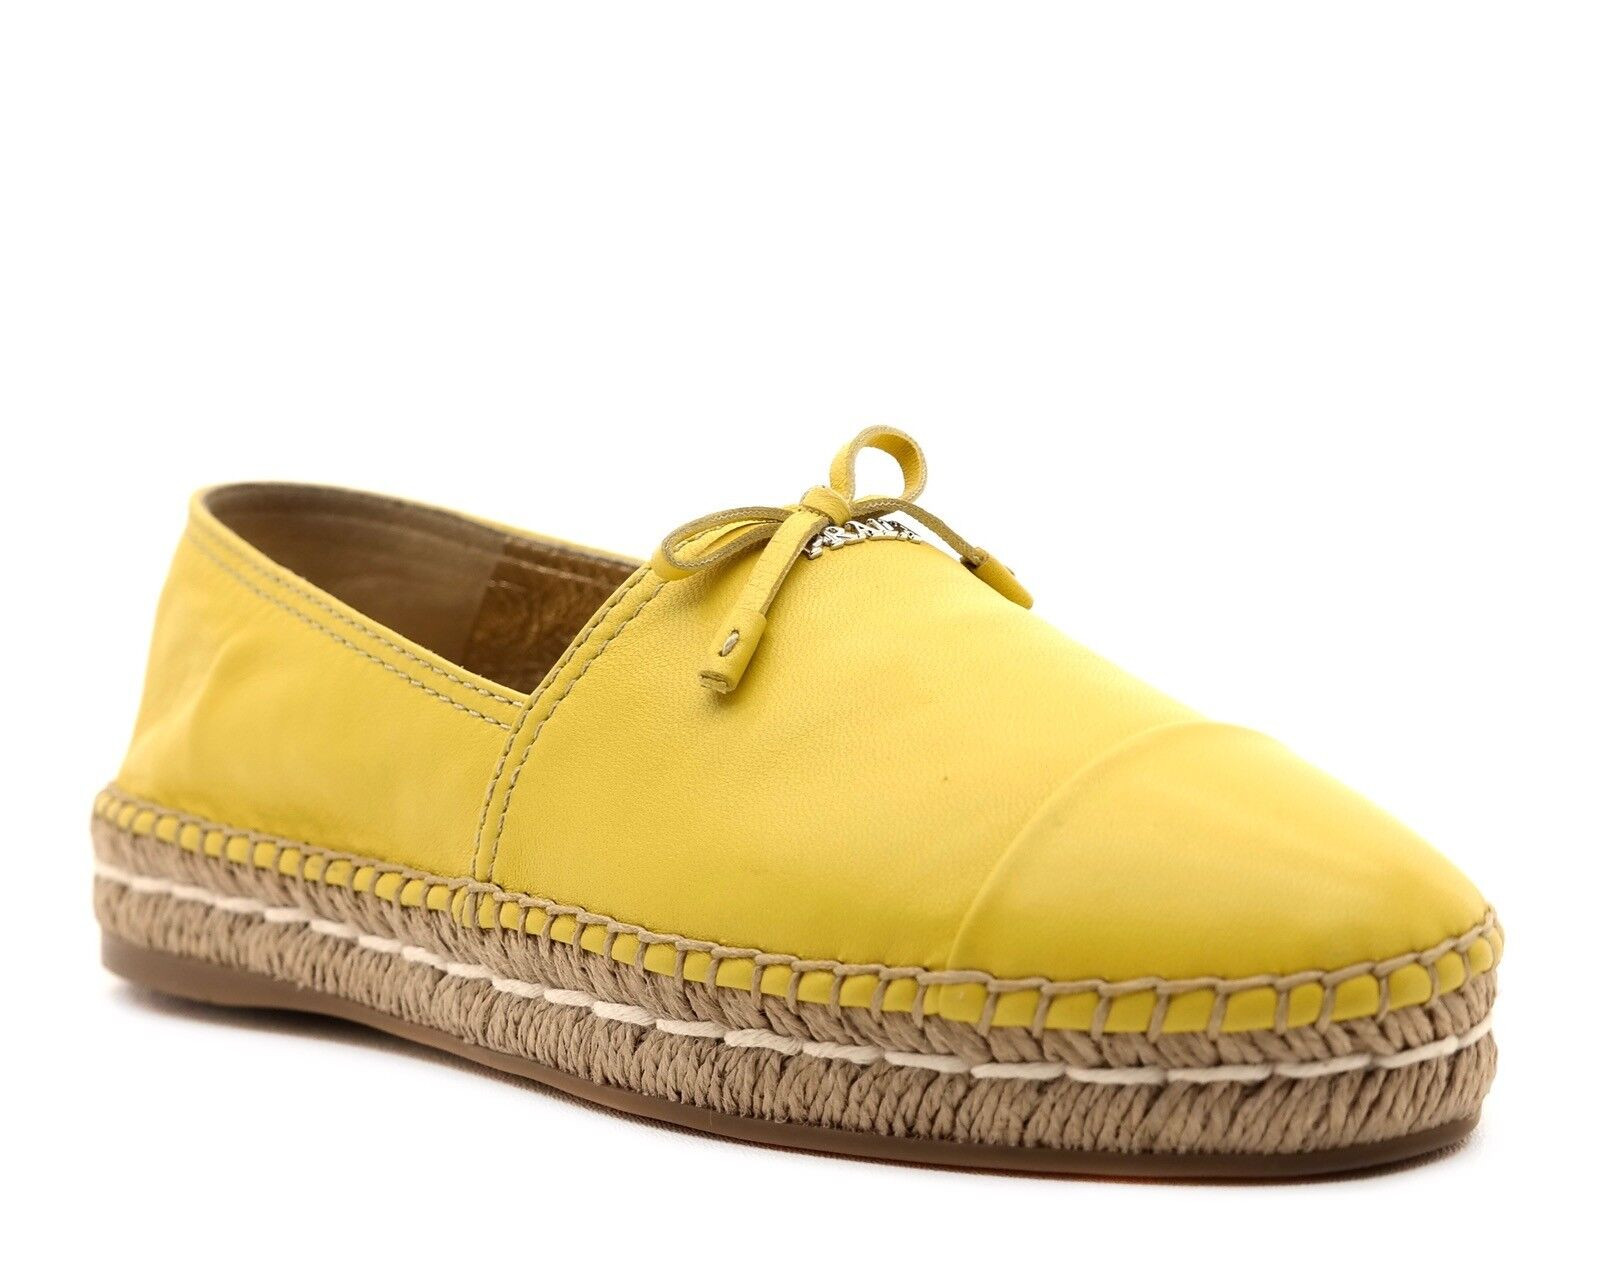 Prada Espadrilles 10 Flats Yellow Leather Size 10 Espadrilles NIB 66192a